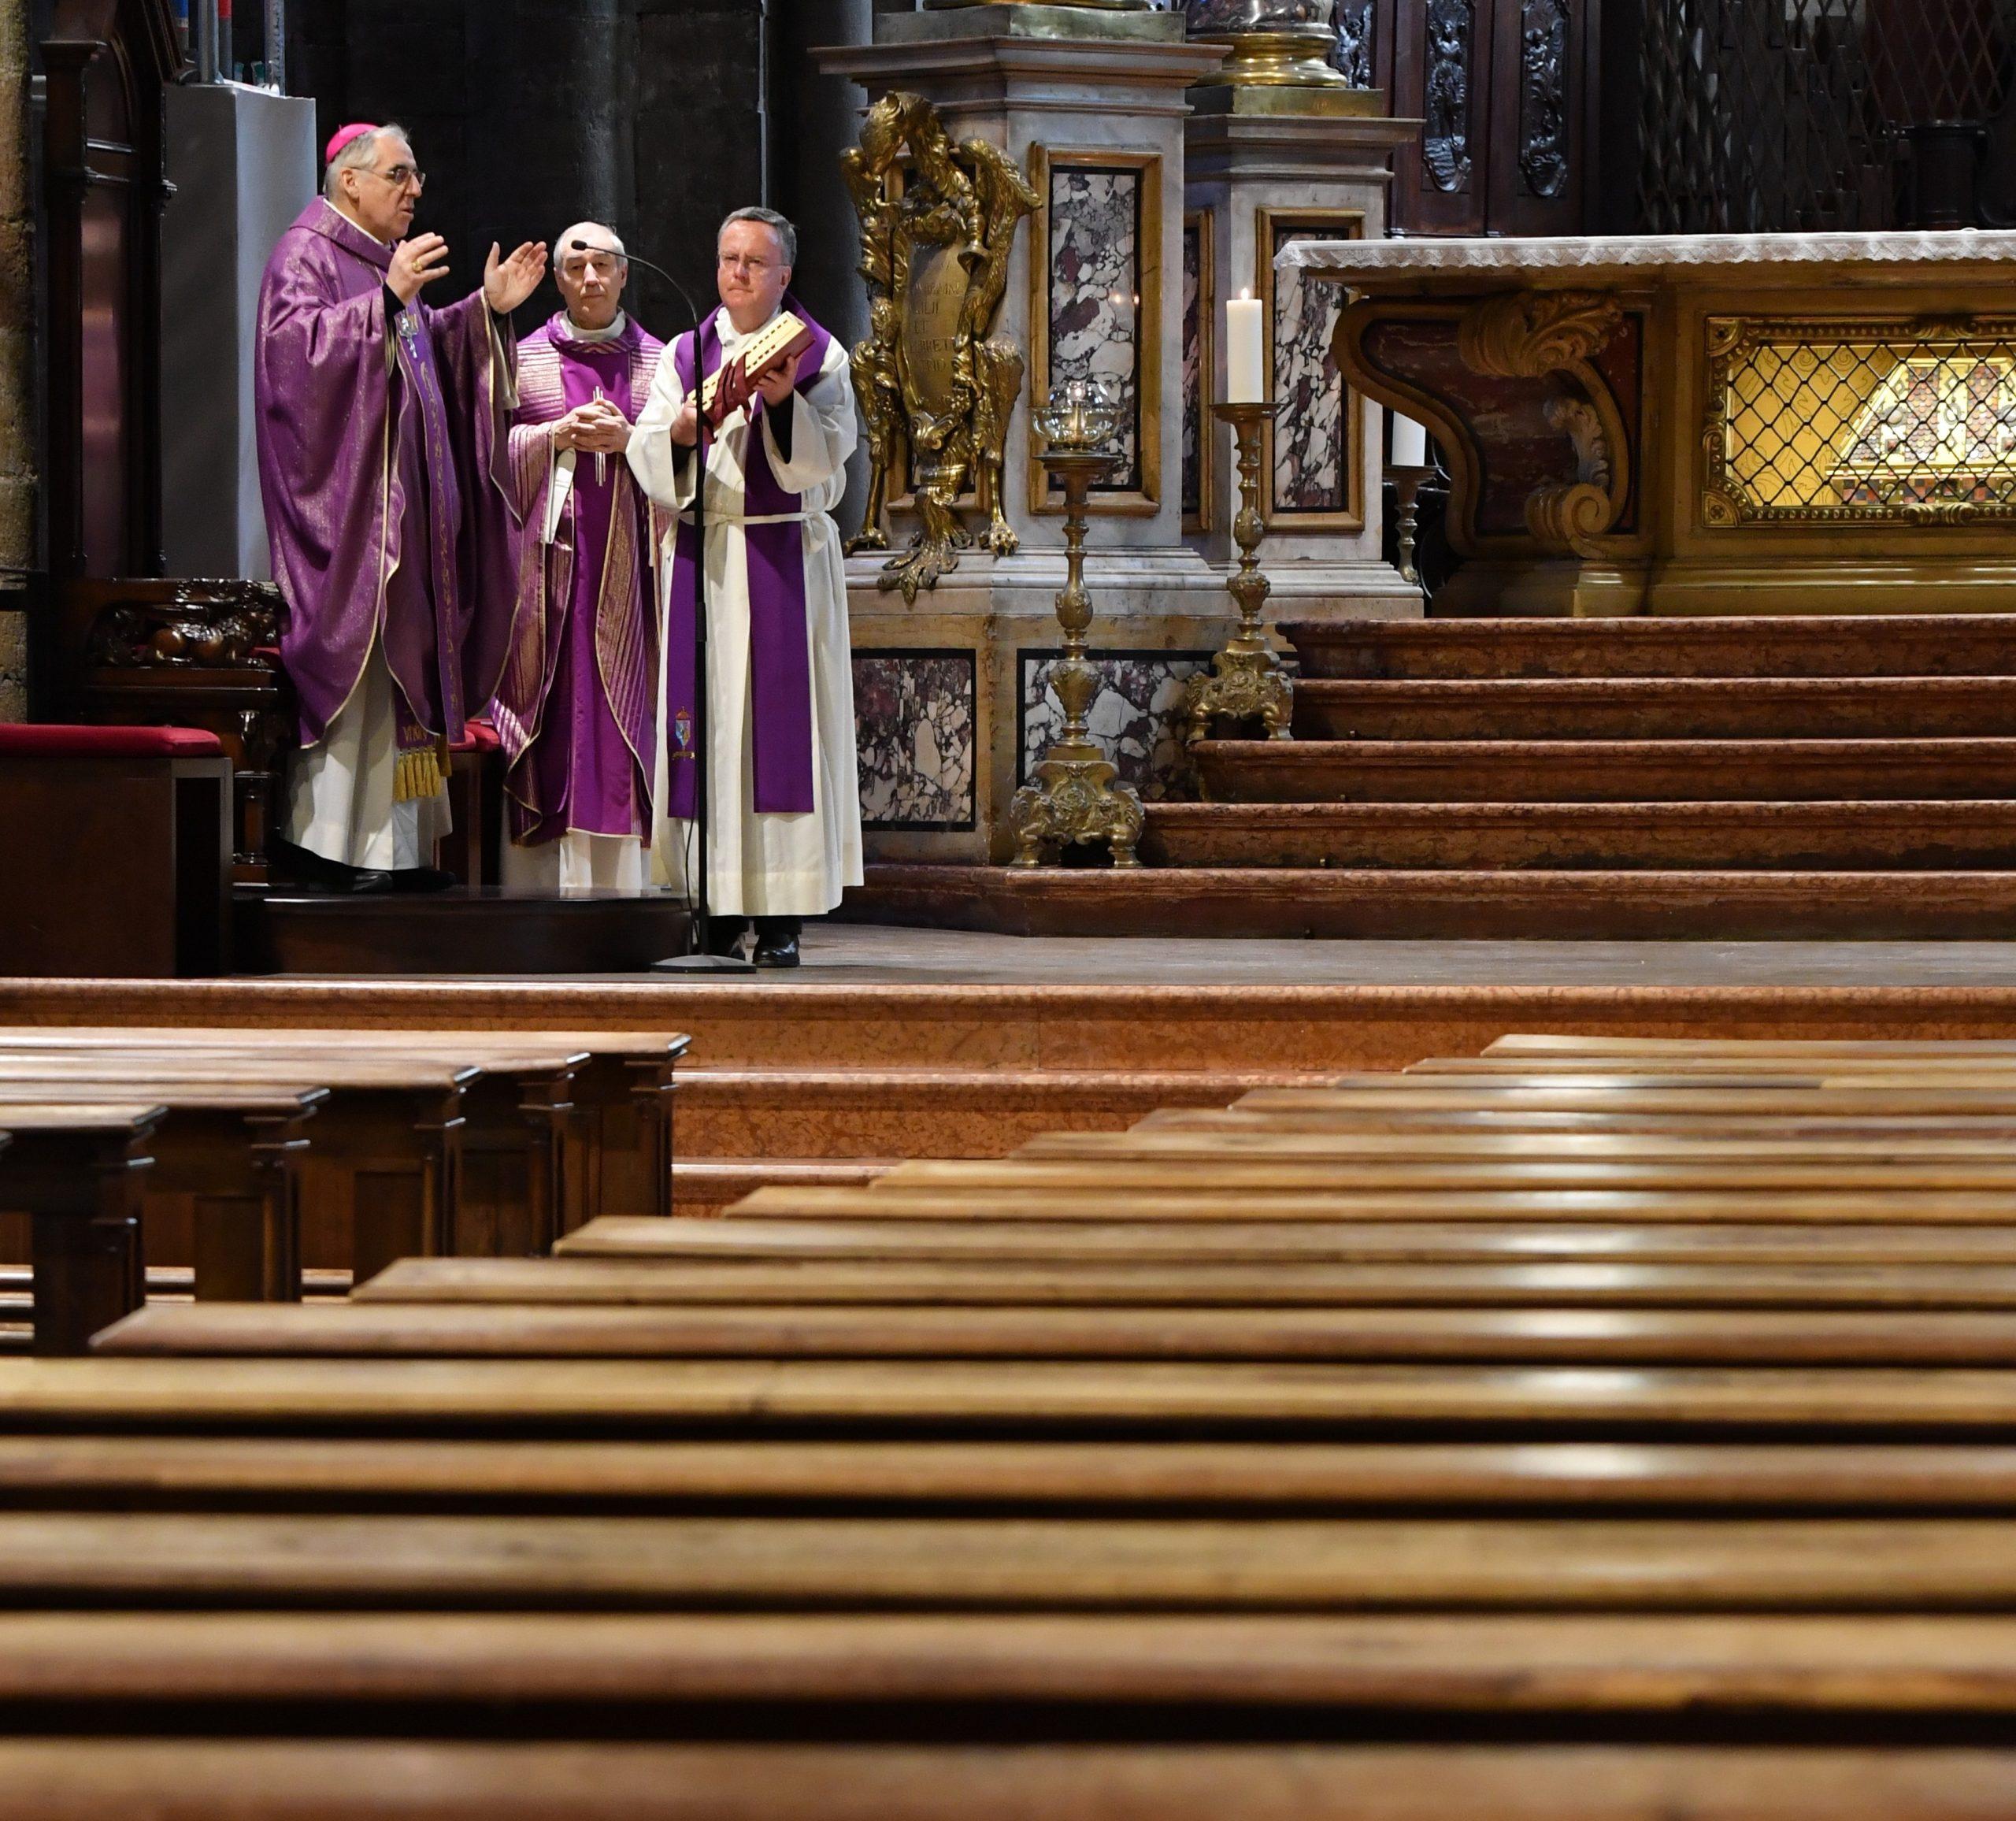 Santa messa in cattedrale